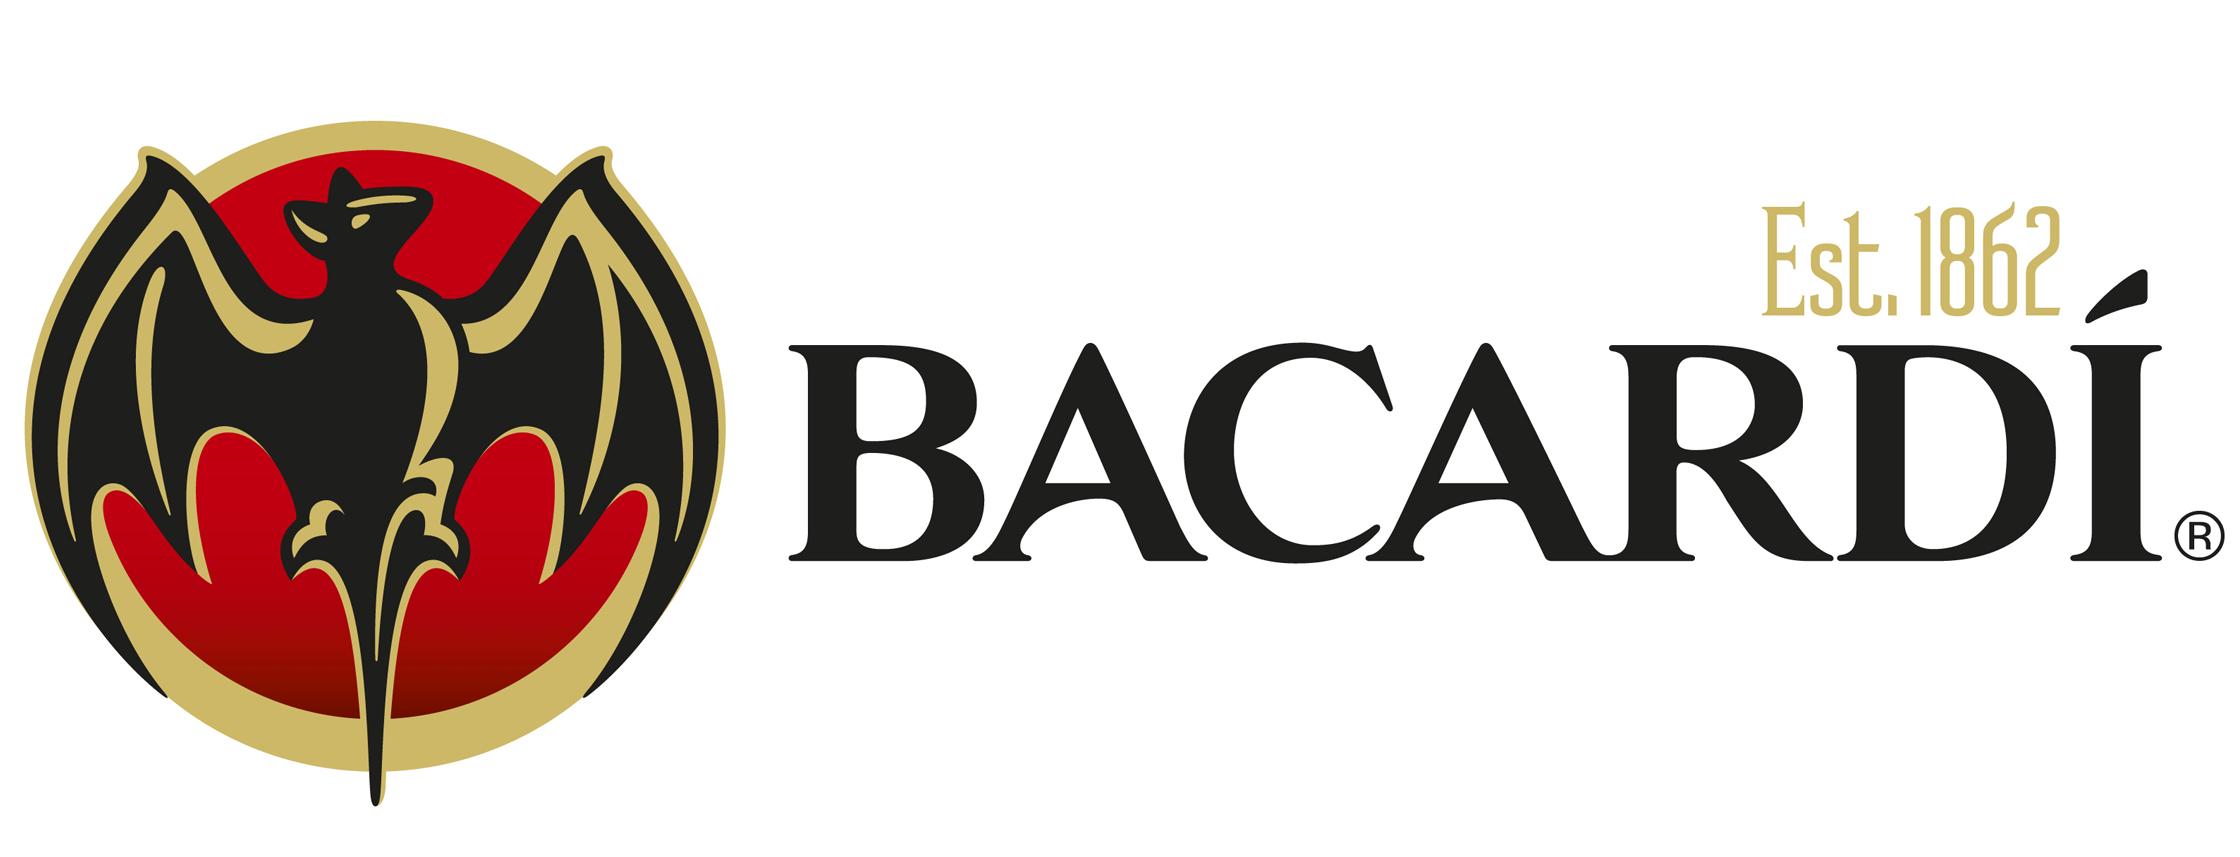 bacardi-limited-png-bacardi-logo-2272